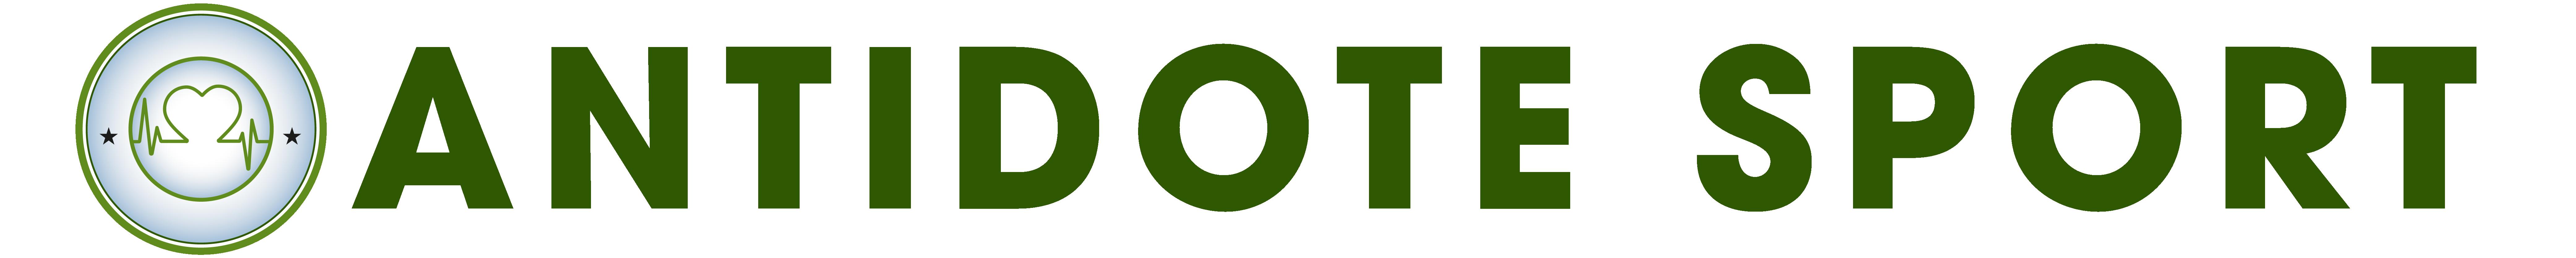 Antidote Sport